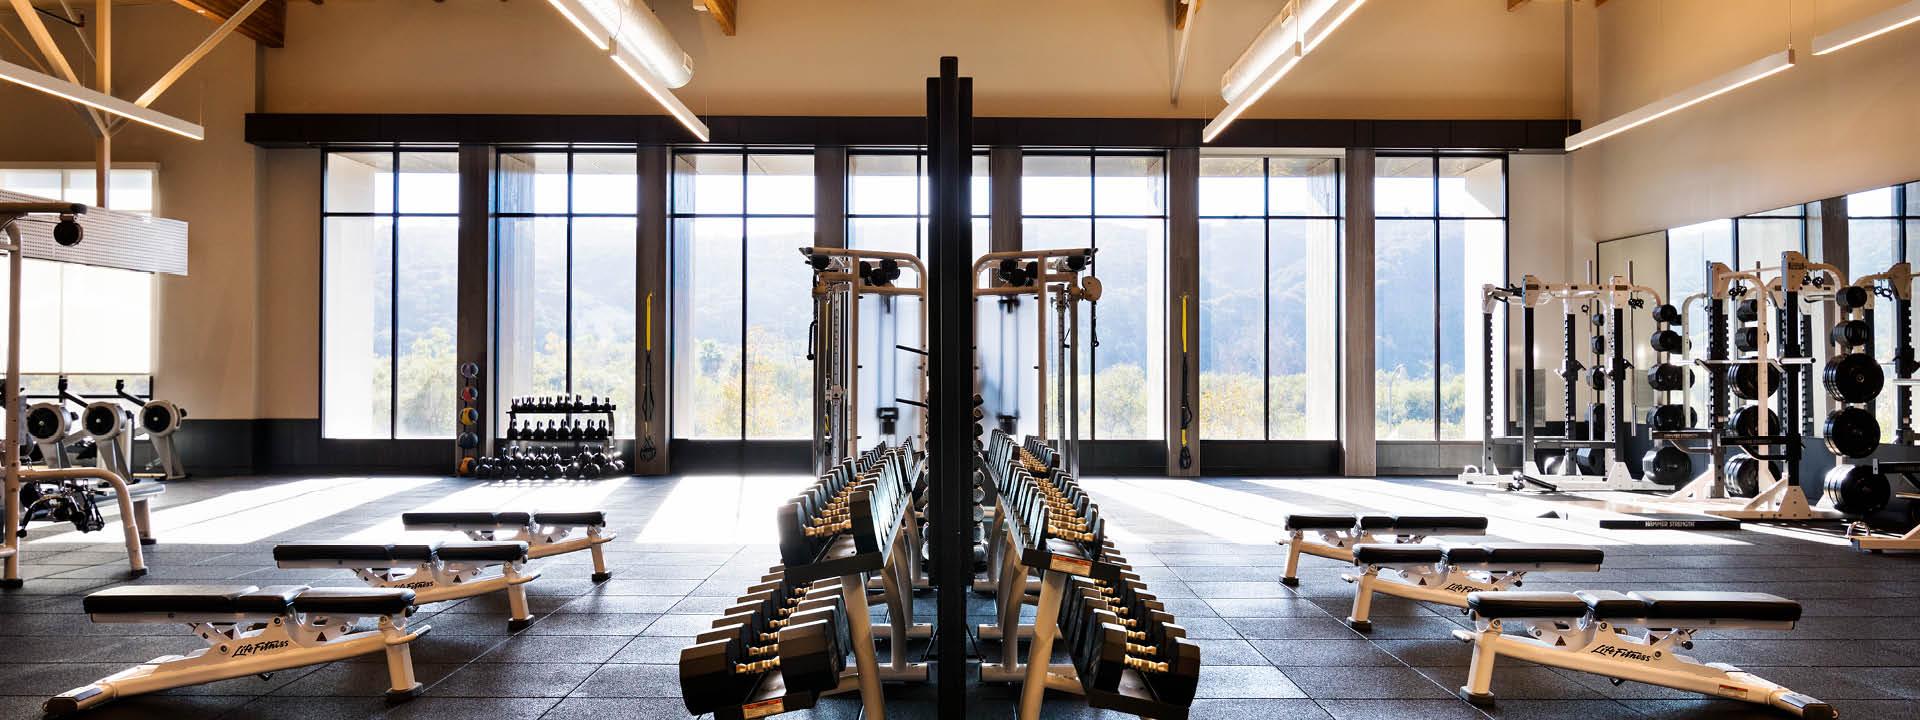 La Fitness Encinitas Schedule Amatfitness Co